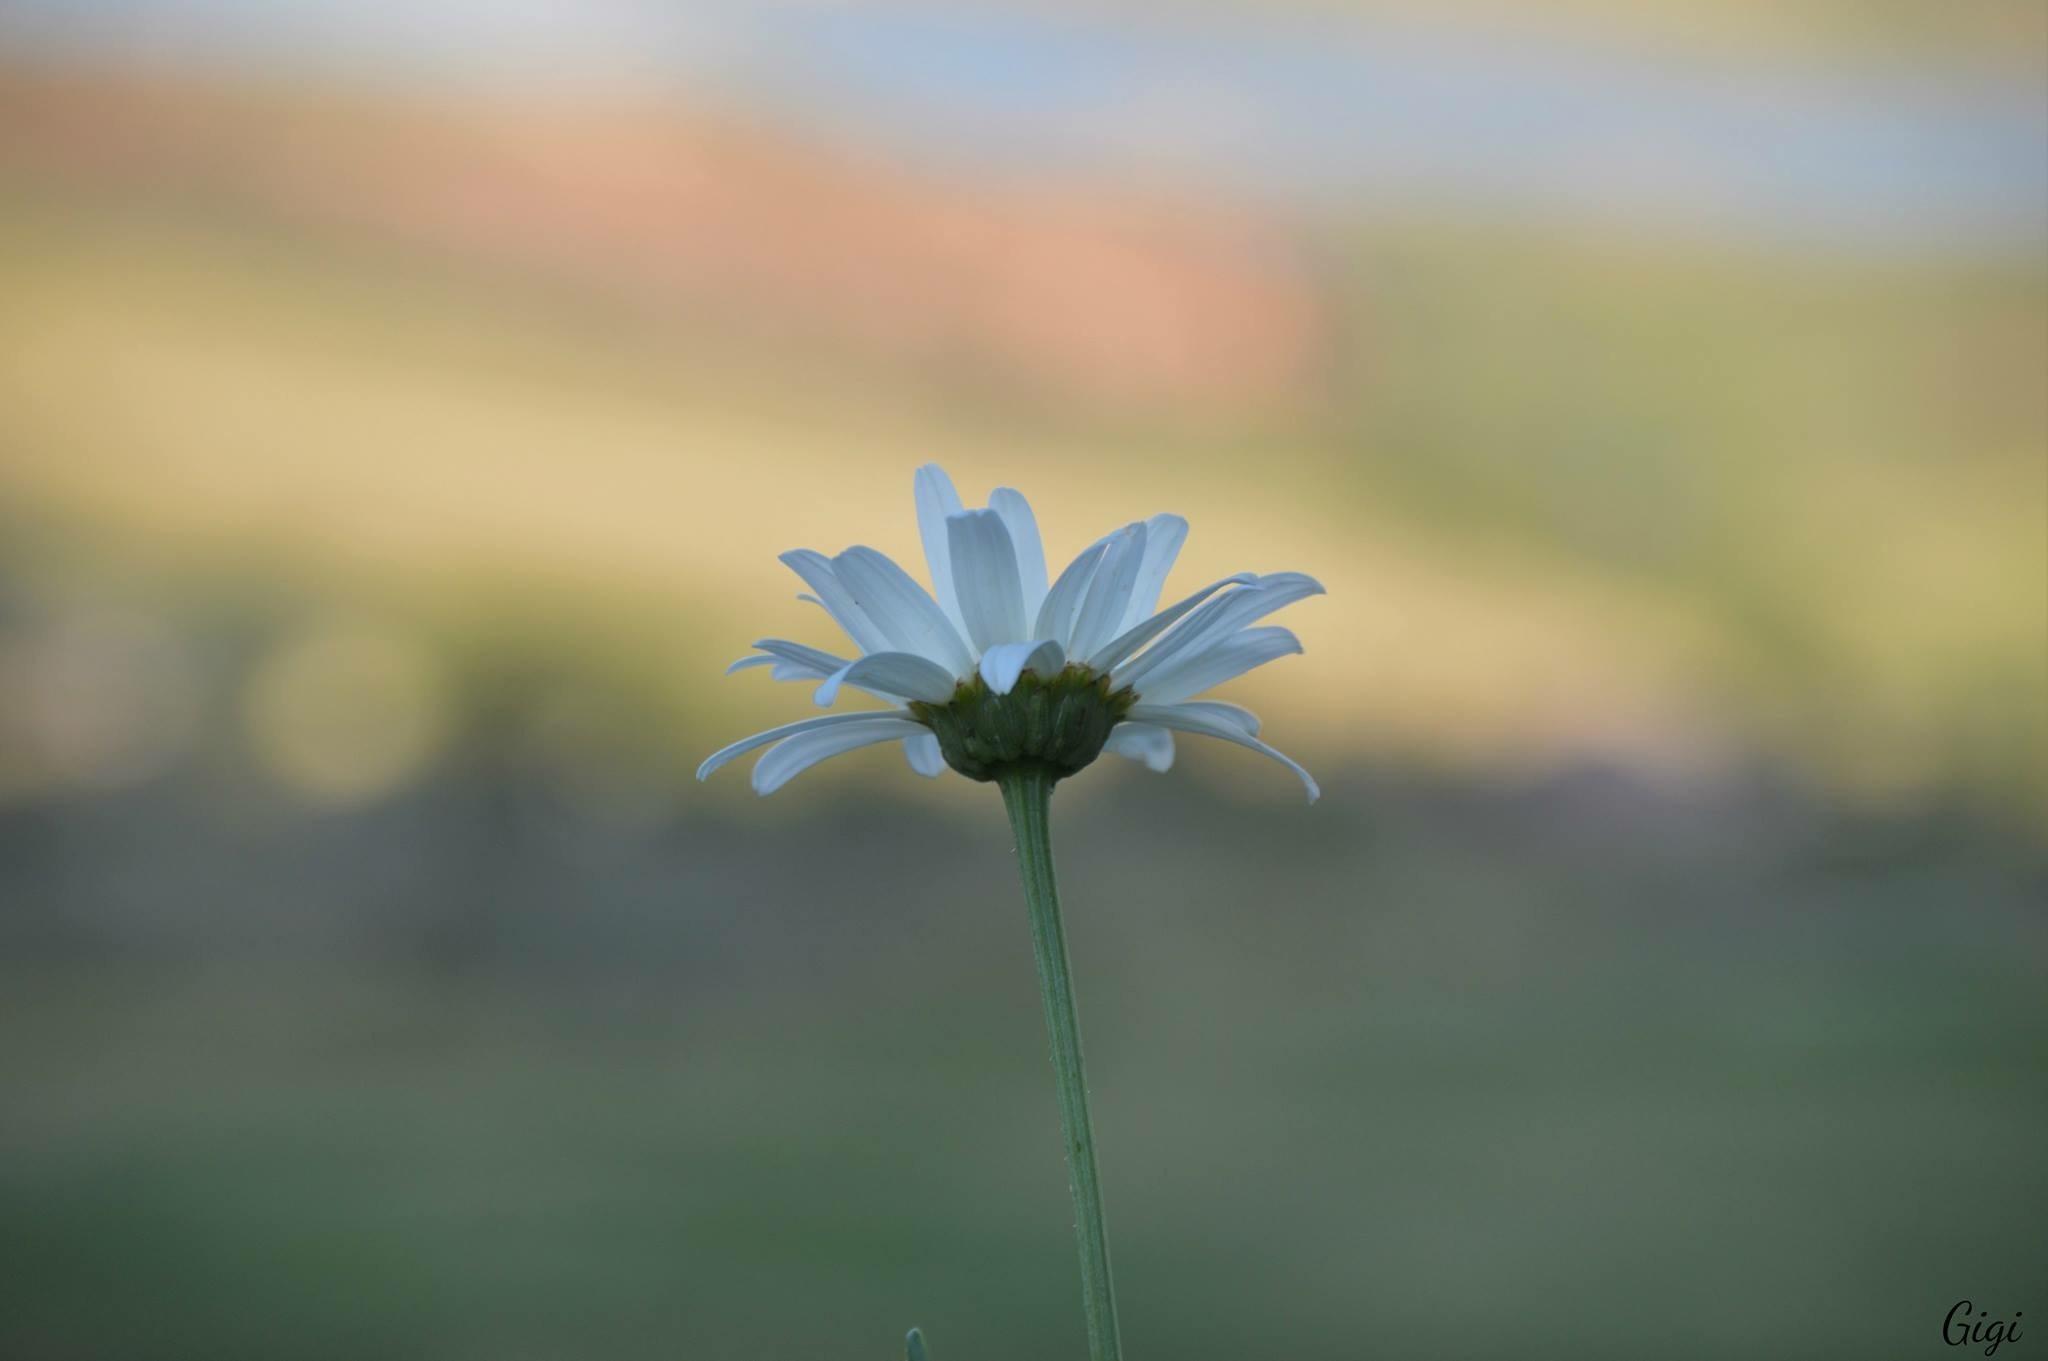 Daisy by Gigi